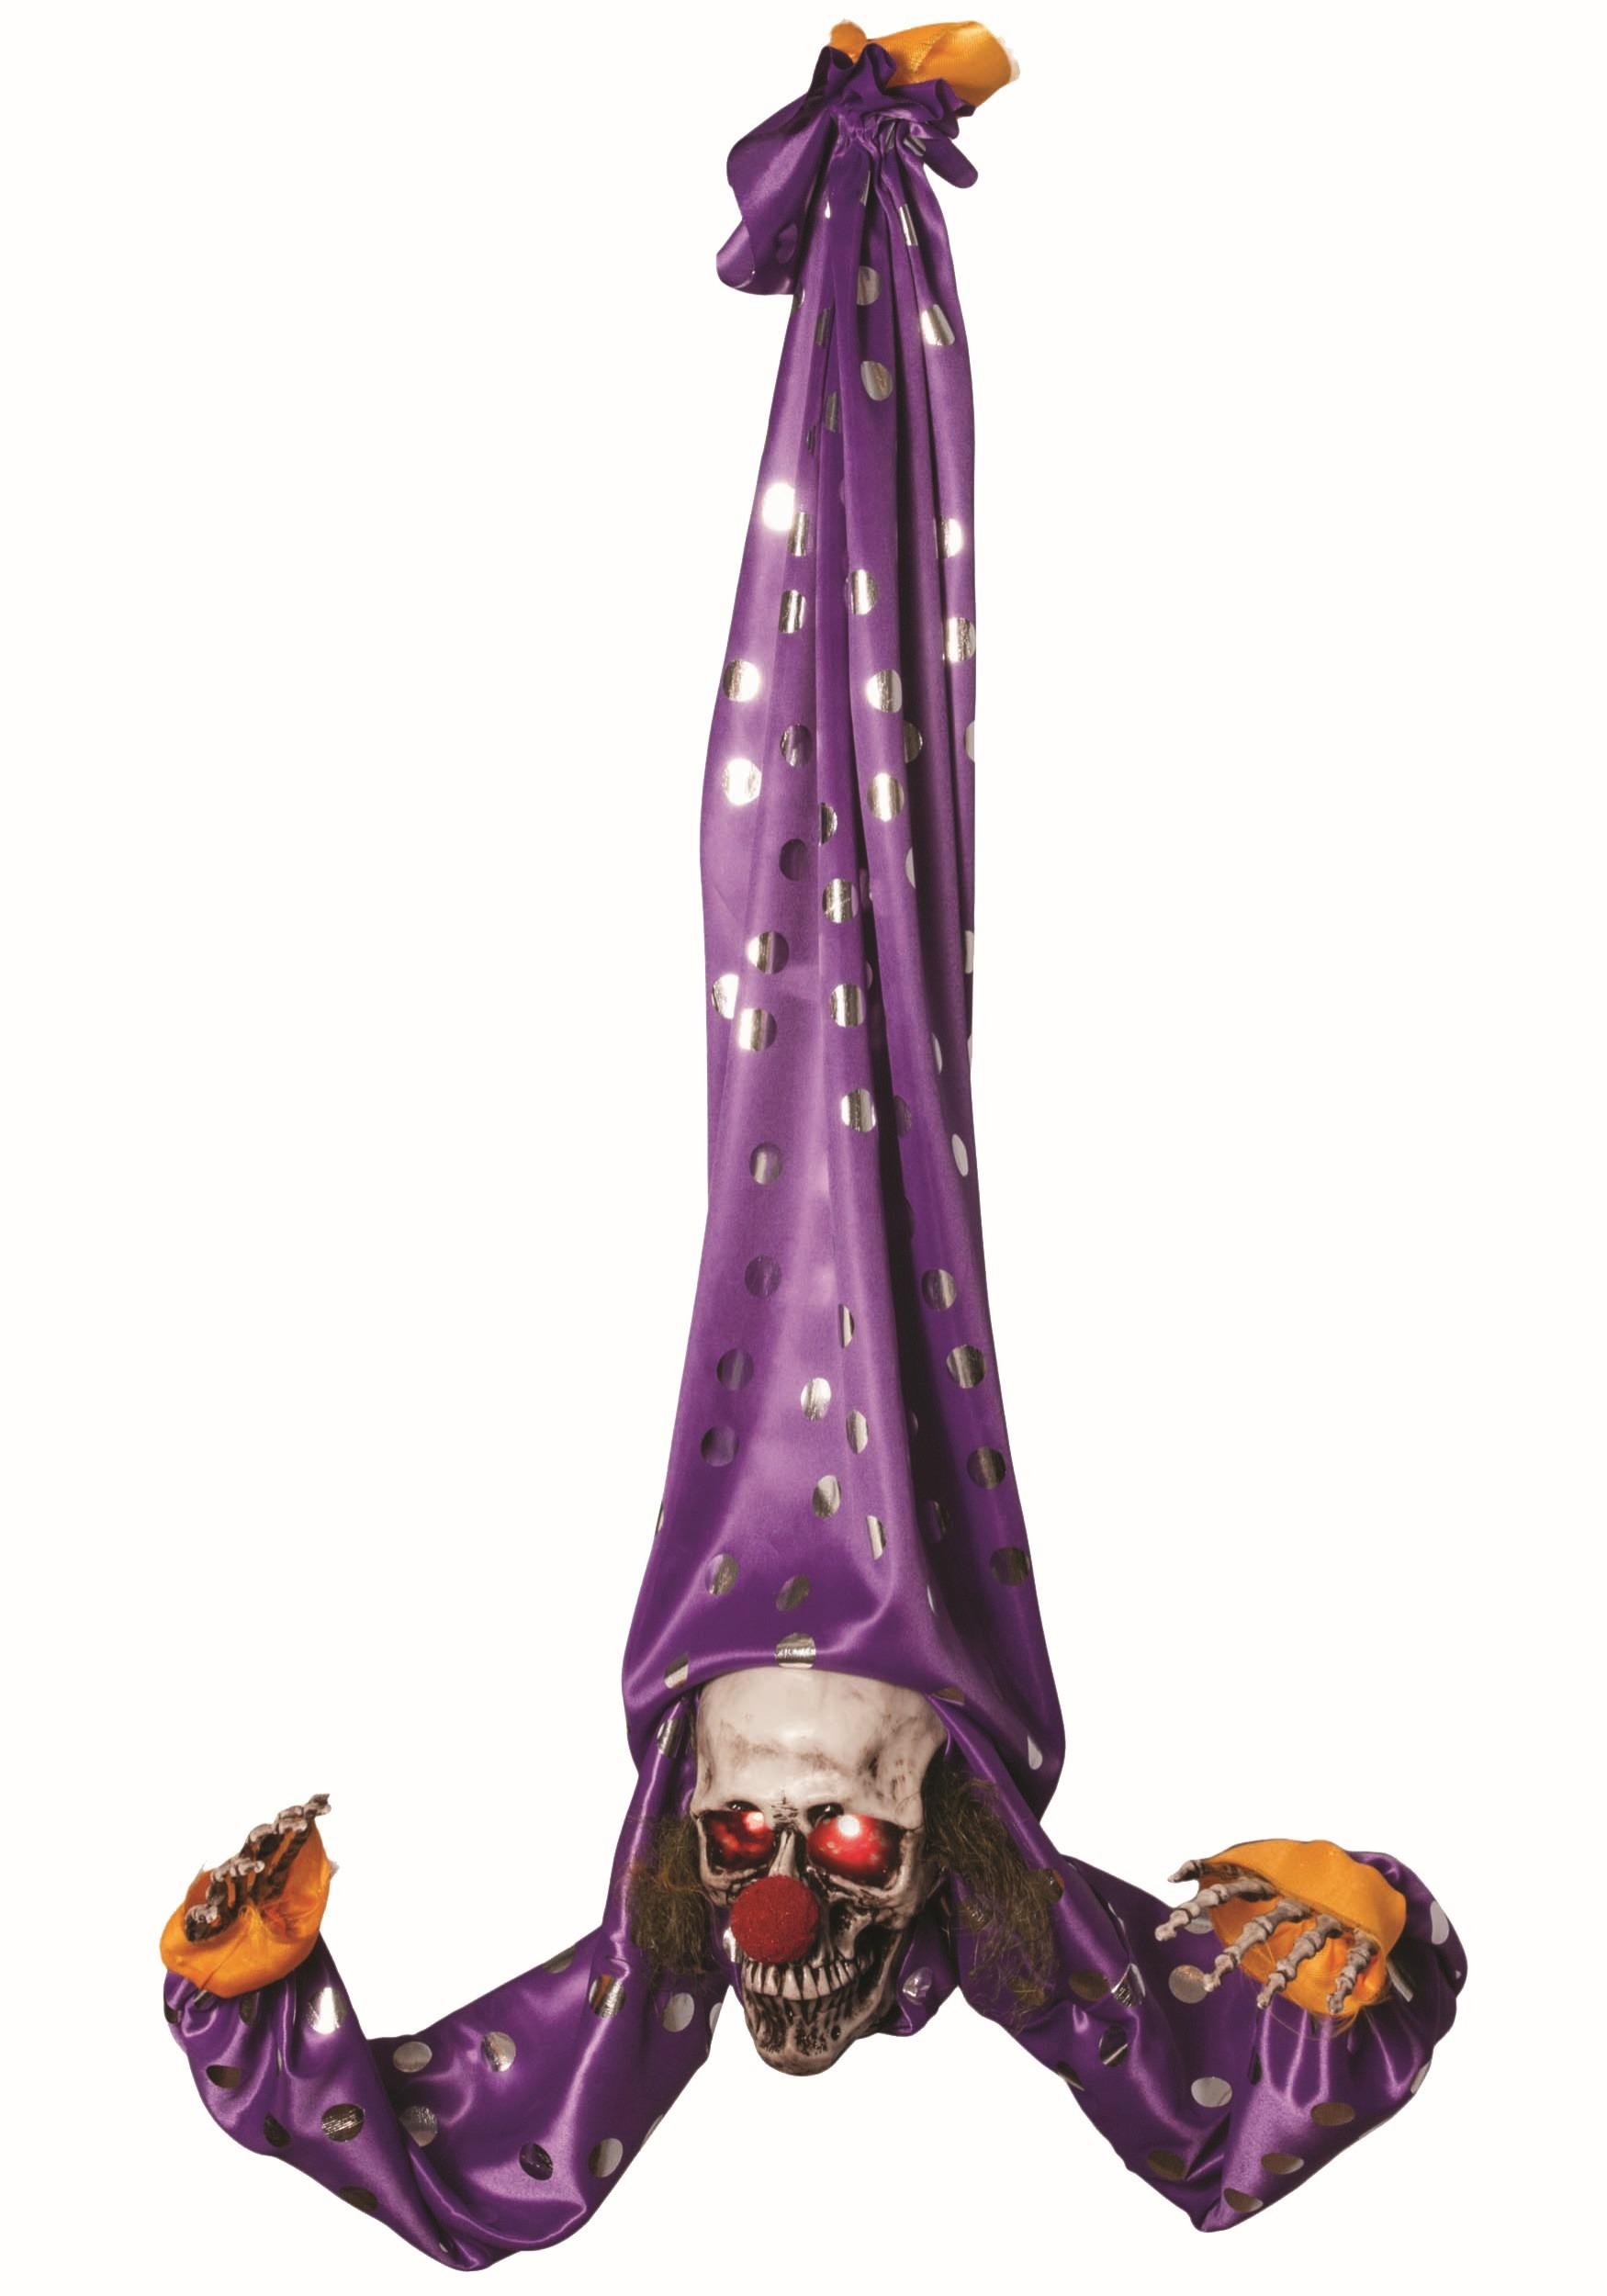 Halloween Animated Upside Down Clown Decoration